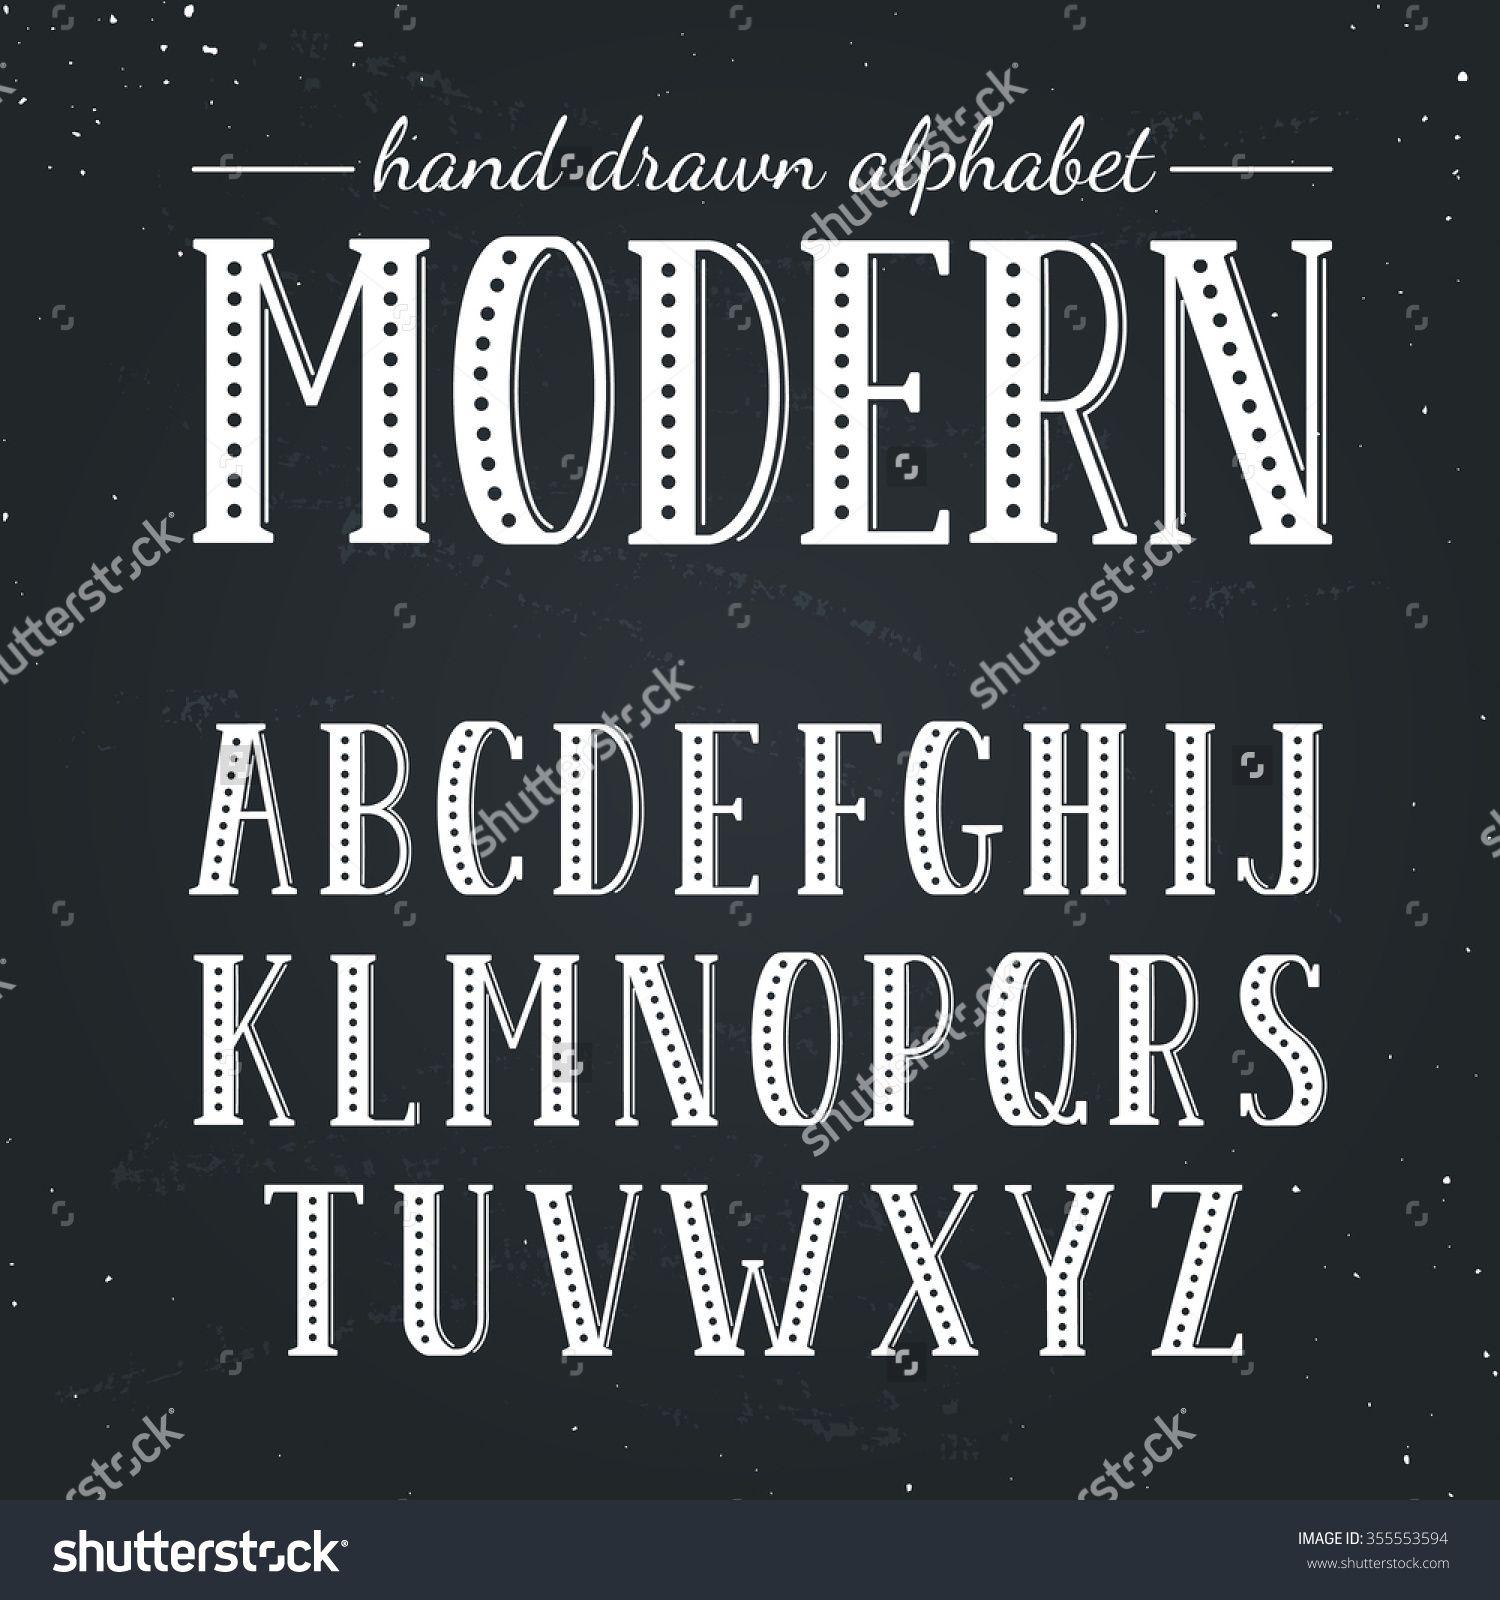 Chalkboard fonts alphabet google search chalkboard pinterest chalkboard fonts for Chalkboard sign font